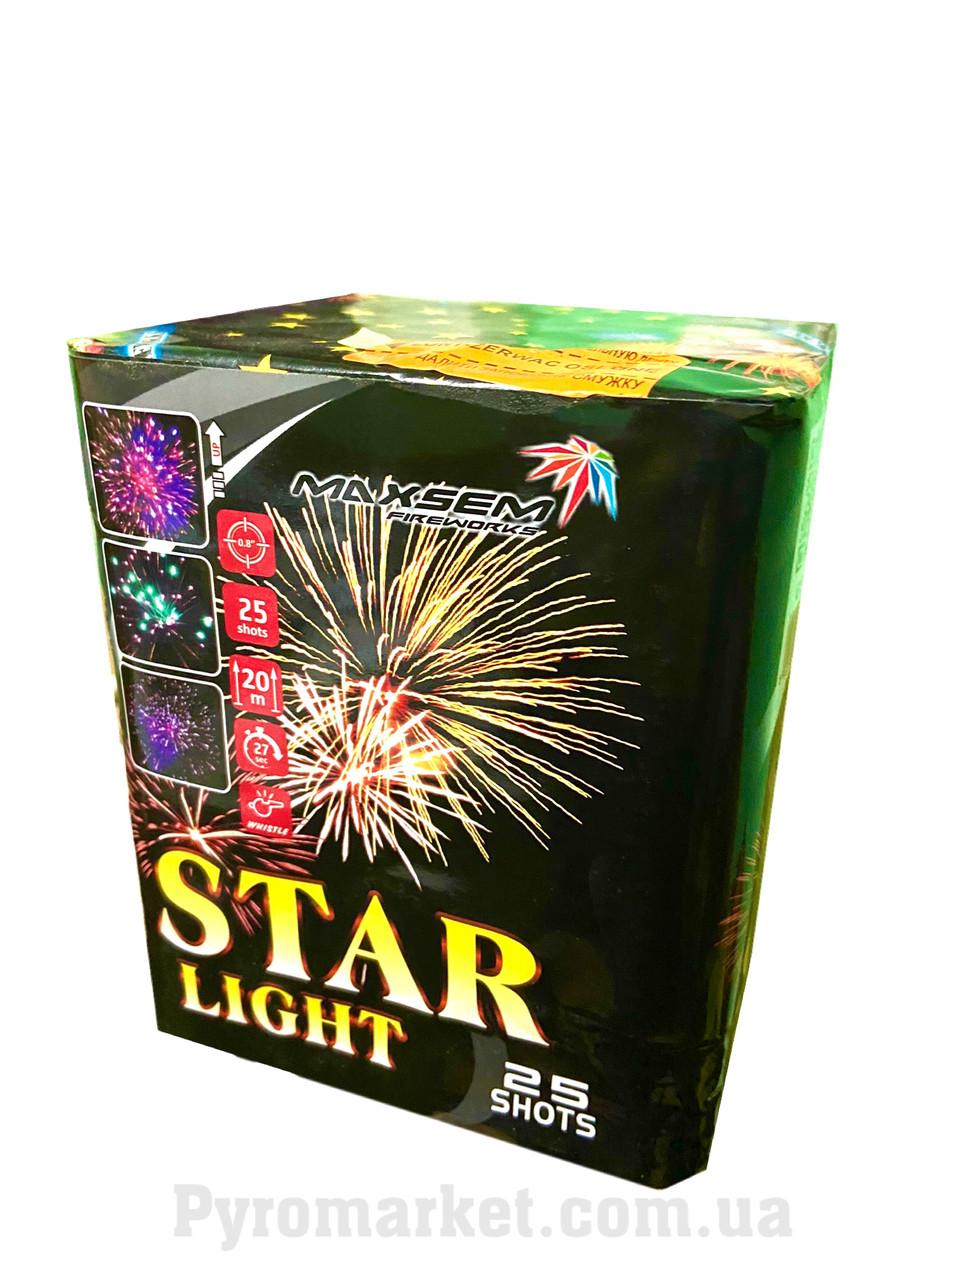 Салют Star Light, Maxsem CP467, 25 выстрелов 20 мм